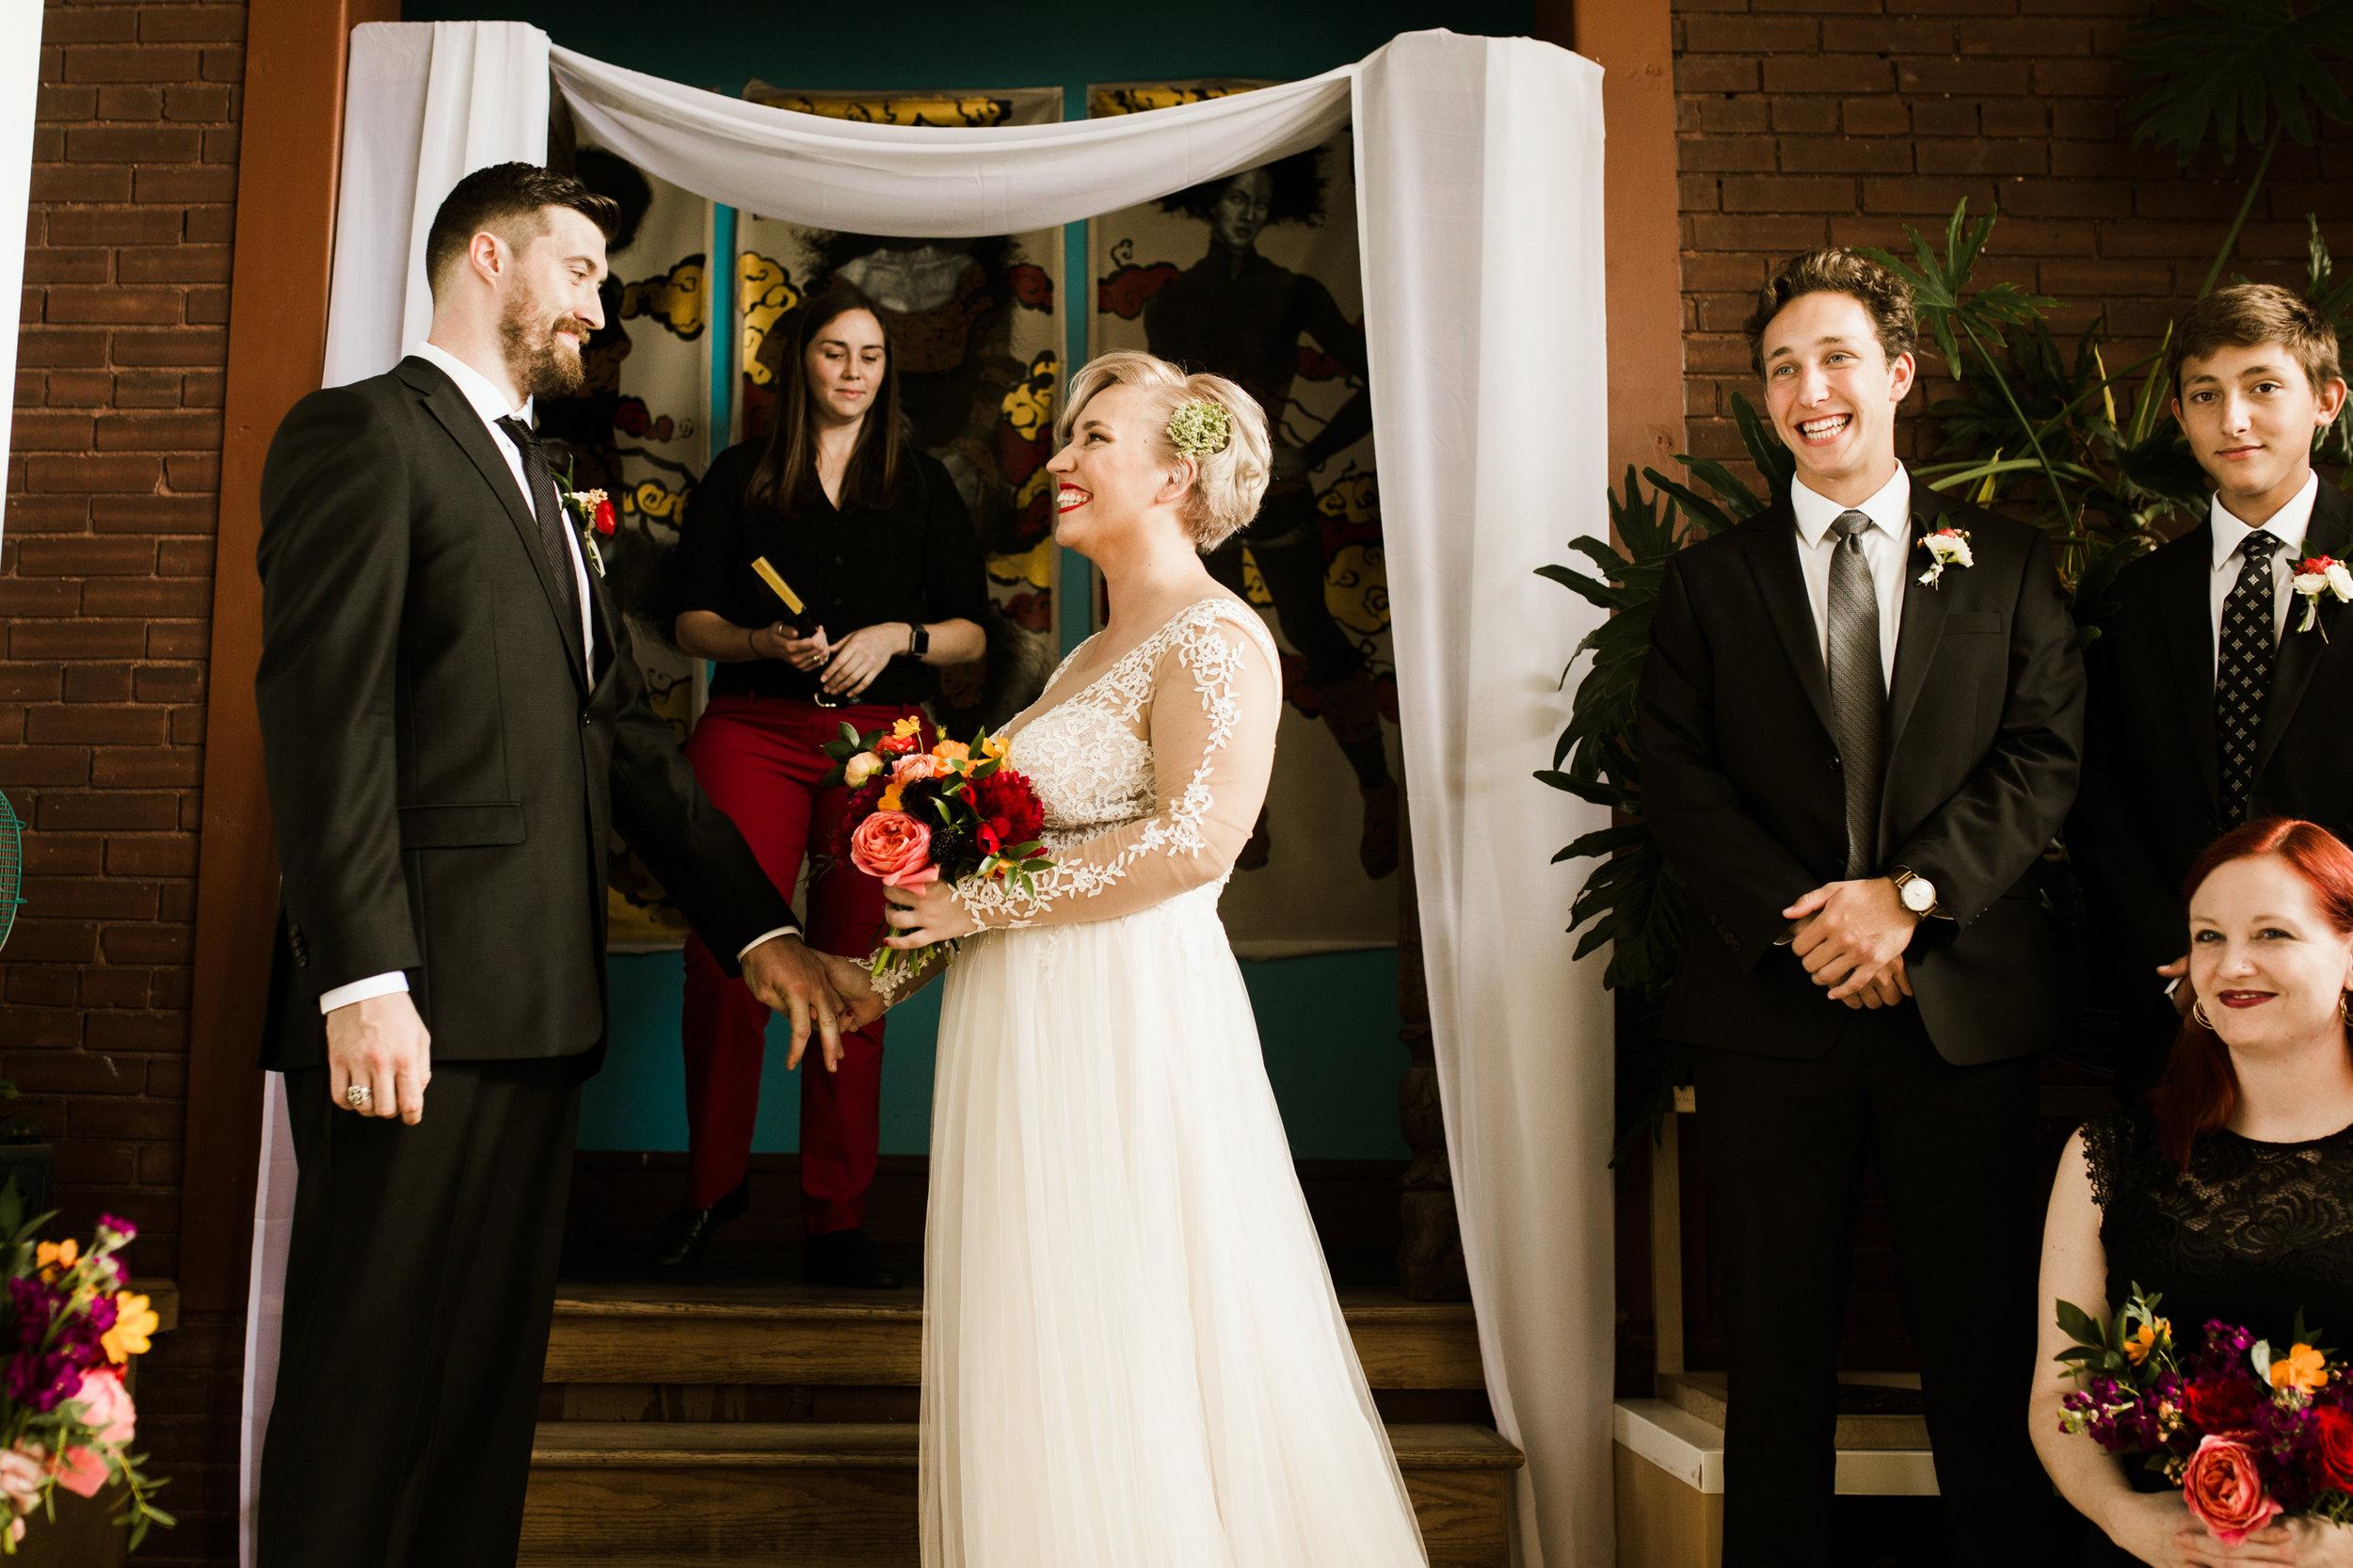 Kentucky Wedding Louisville Wedding Photographer 2018 Crystal Ludwick Photo Louisville Wedding Photographer Kentucky Wedding Photographer (30 of 105).jpg